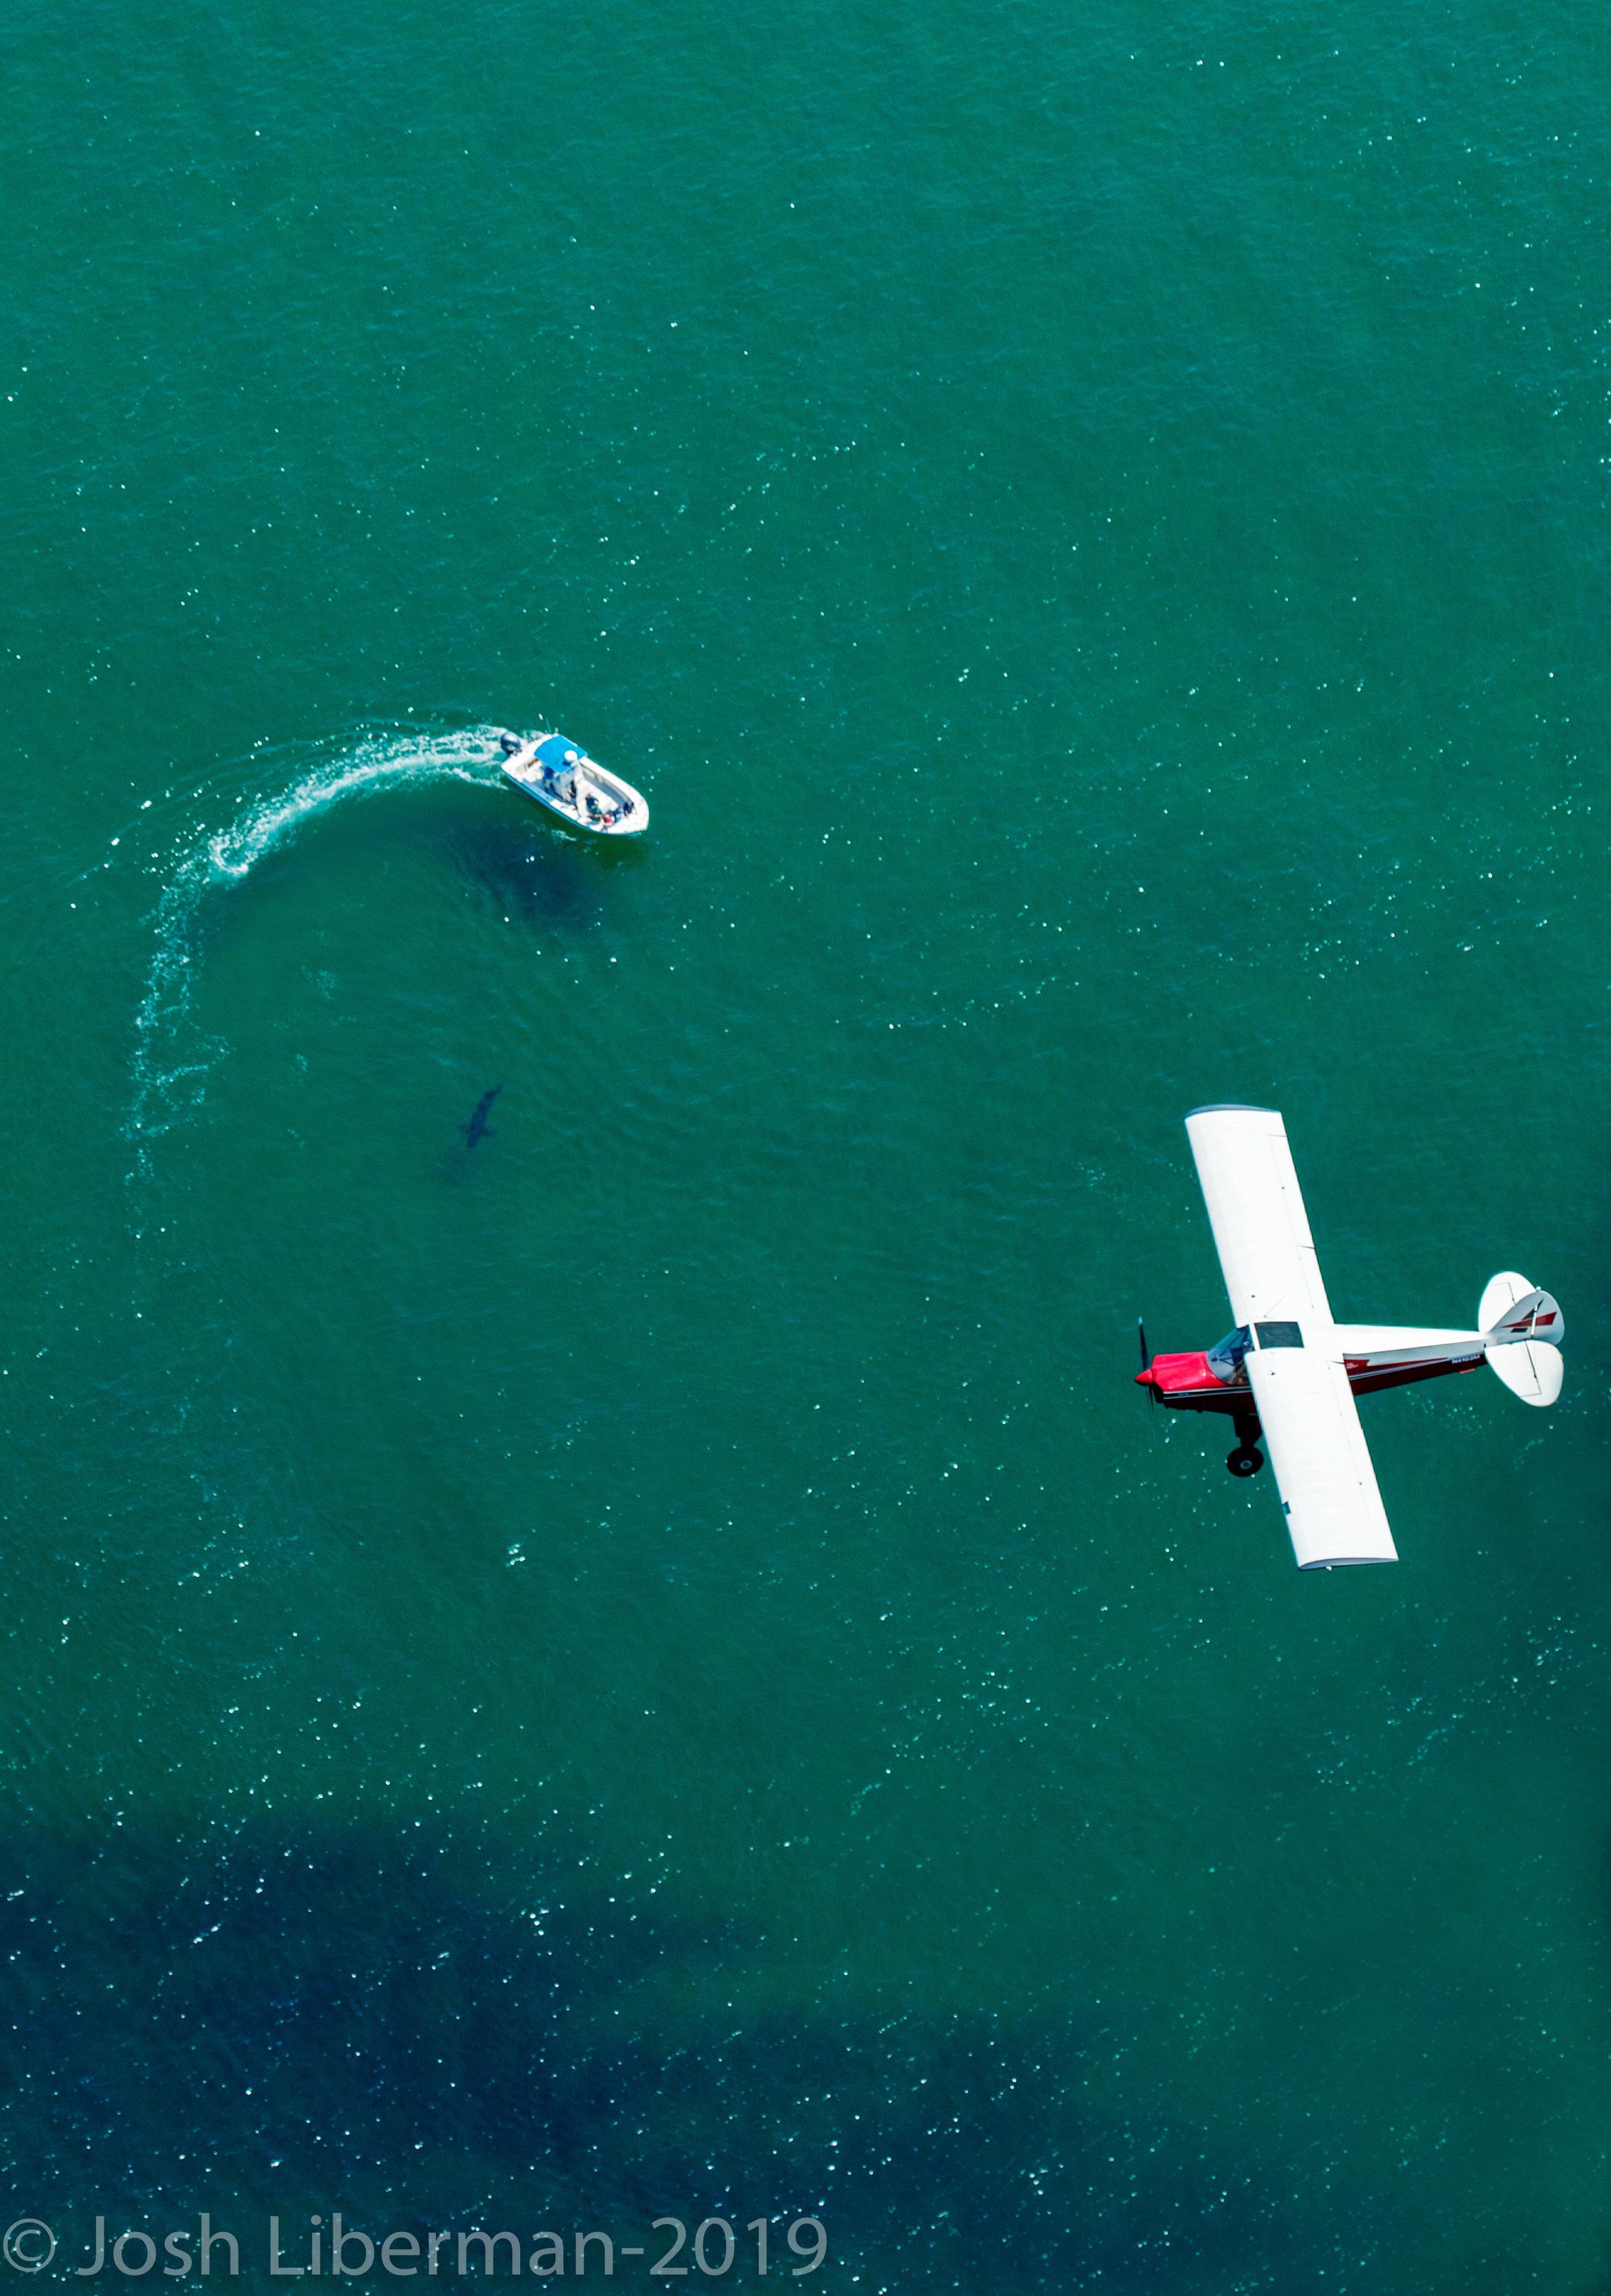 Spotter planes help ecotourism groups find white sharks.